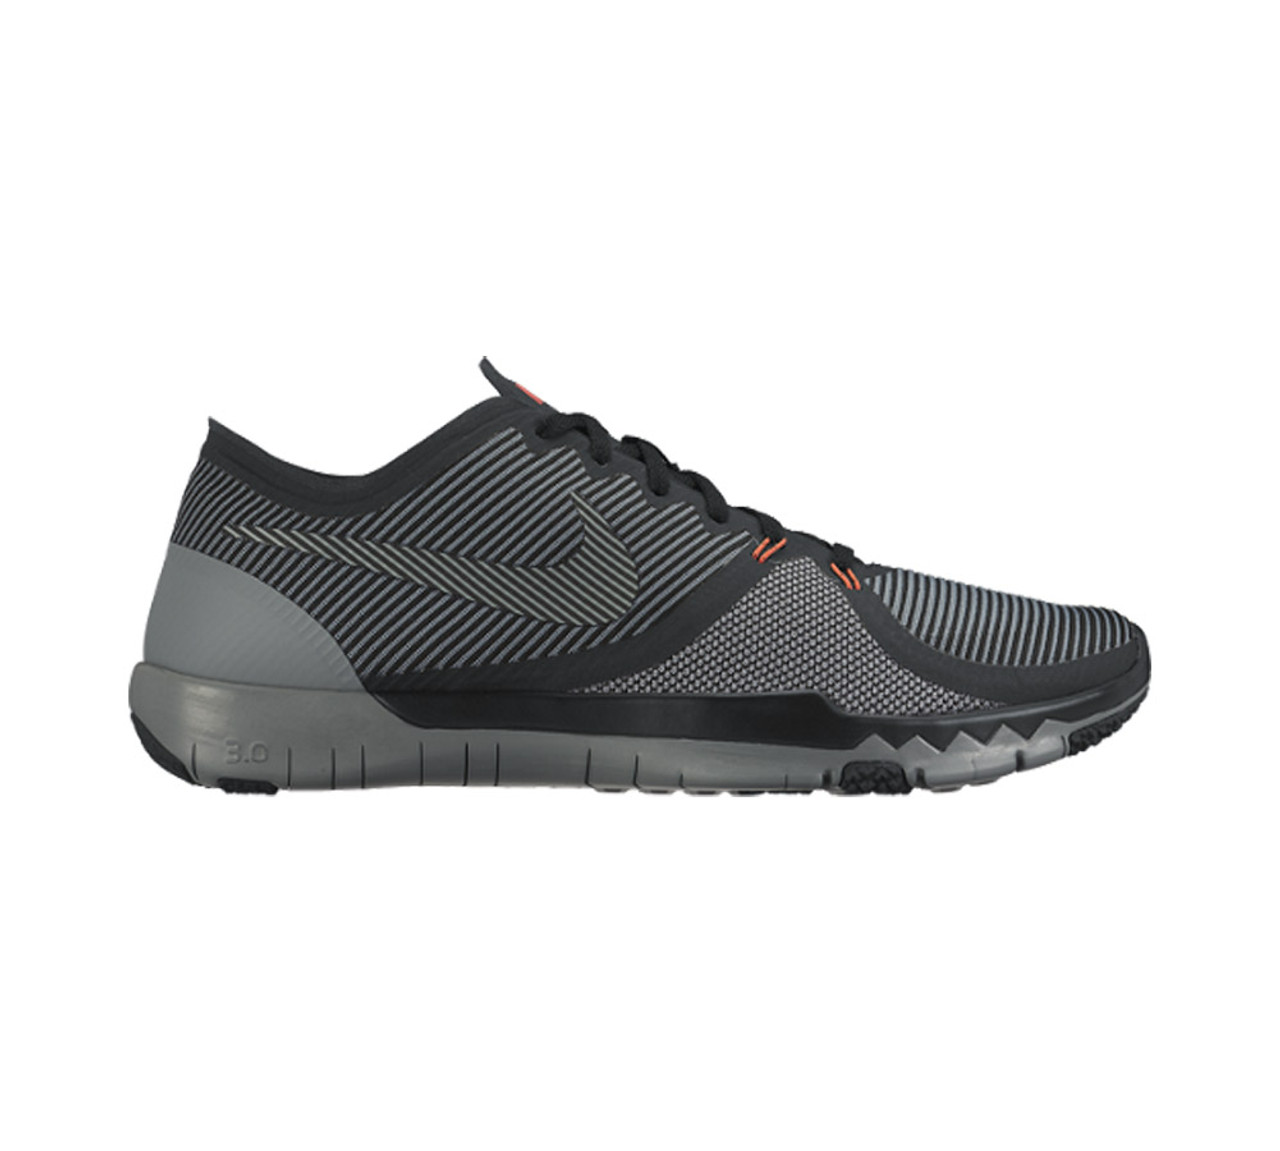 big sale 3e1b6 232e2 Nike Men's Free Trainer 3.0 V4 Cross Trainer Black/Grey